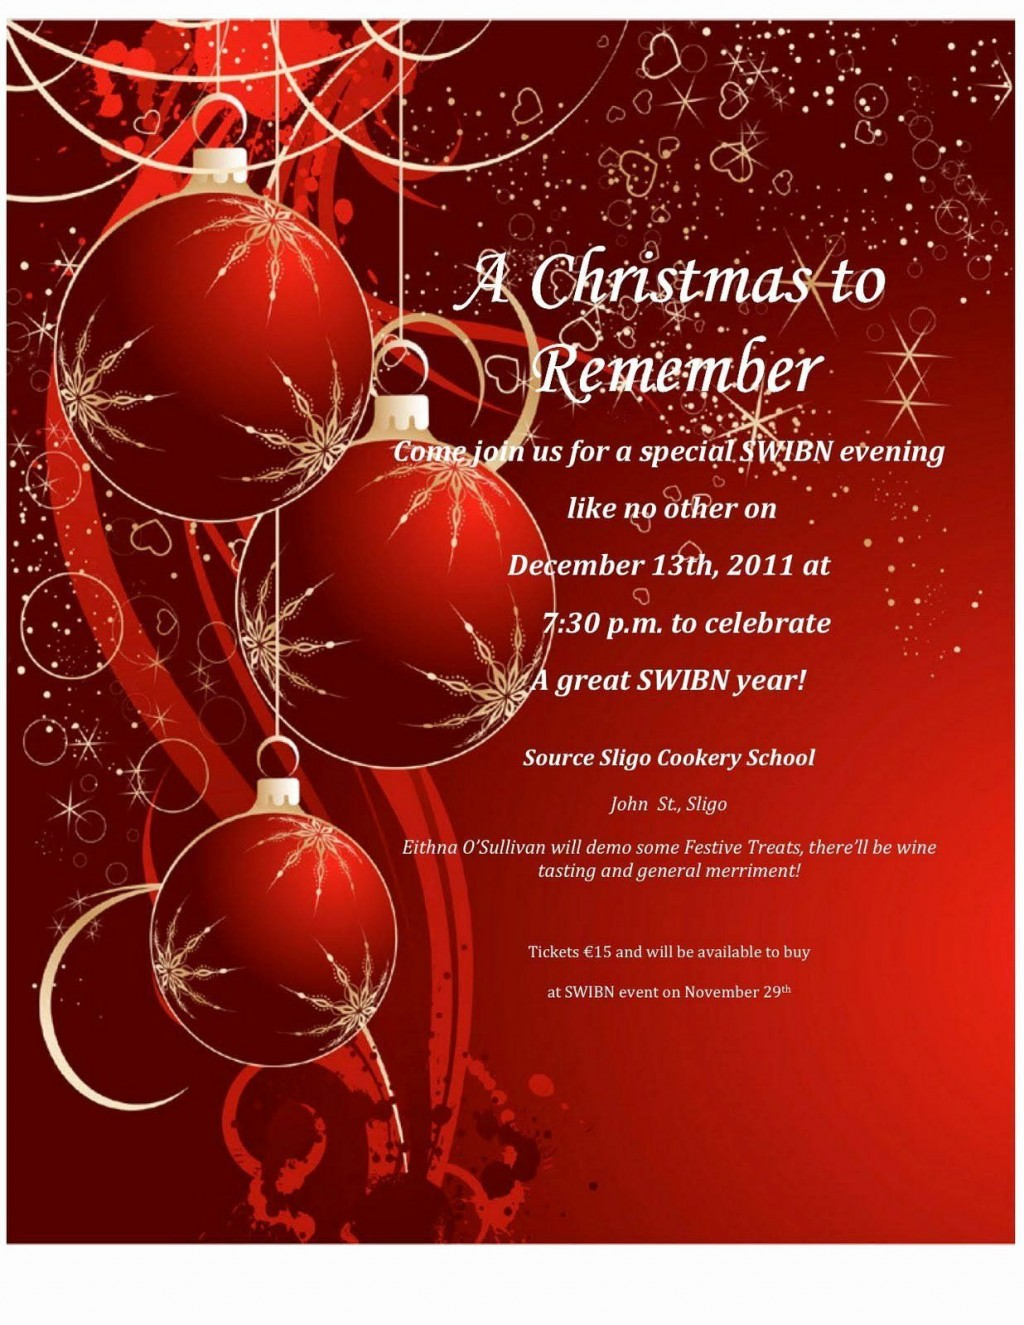 007 Wondrou Xma Party Invite Template Free Inspiration  Holiday Invitation Word Printable Office Christma DownloadLarge